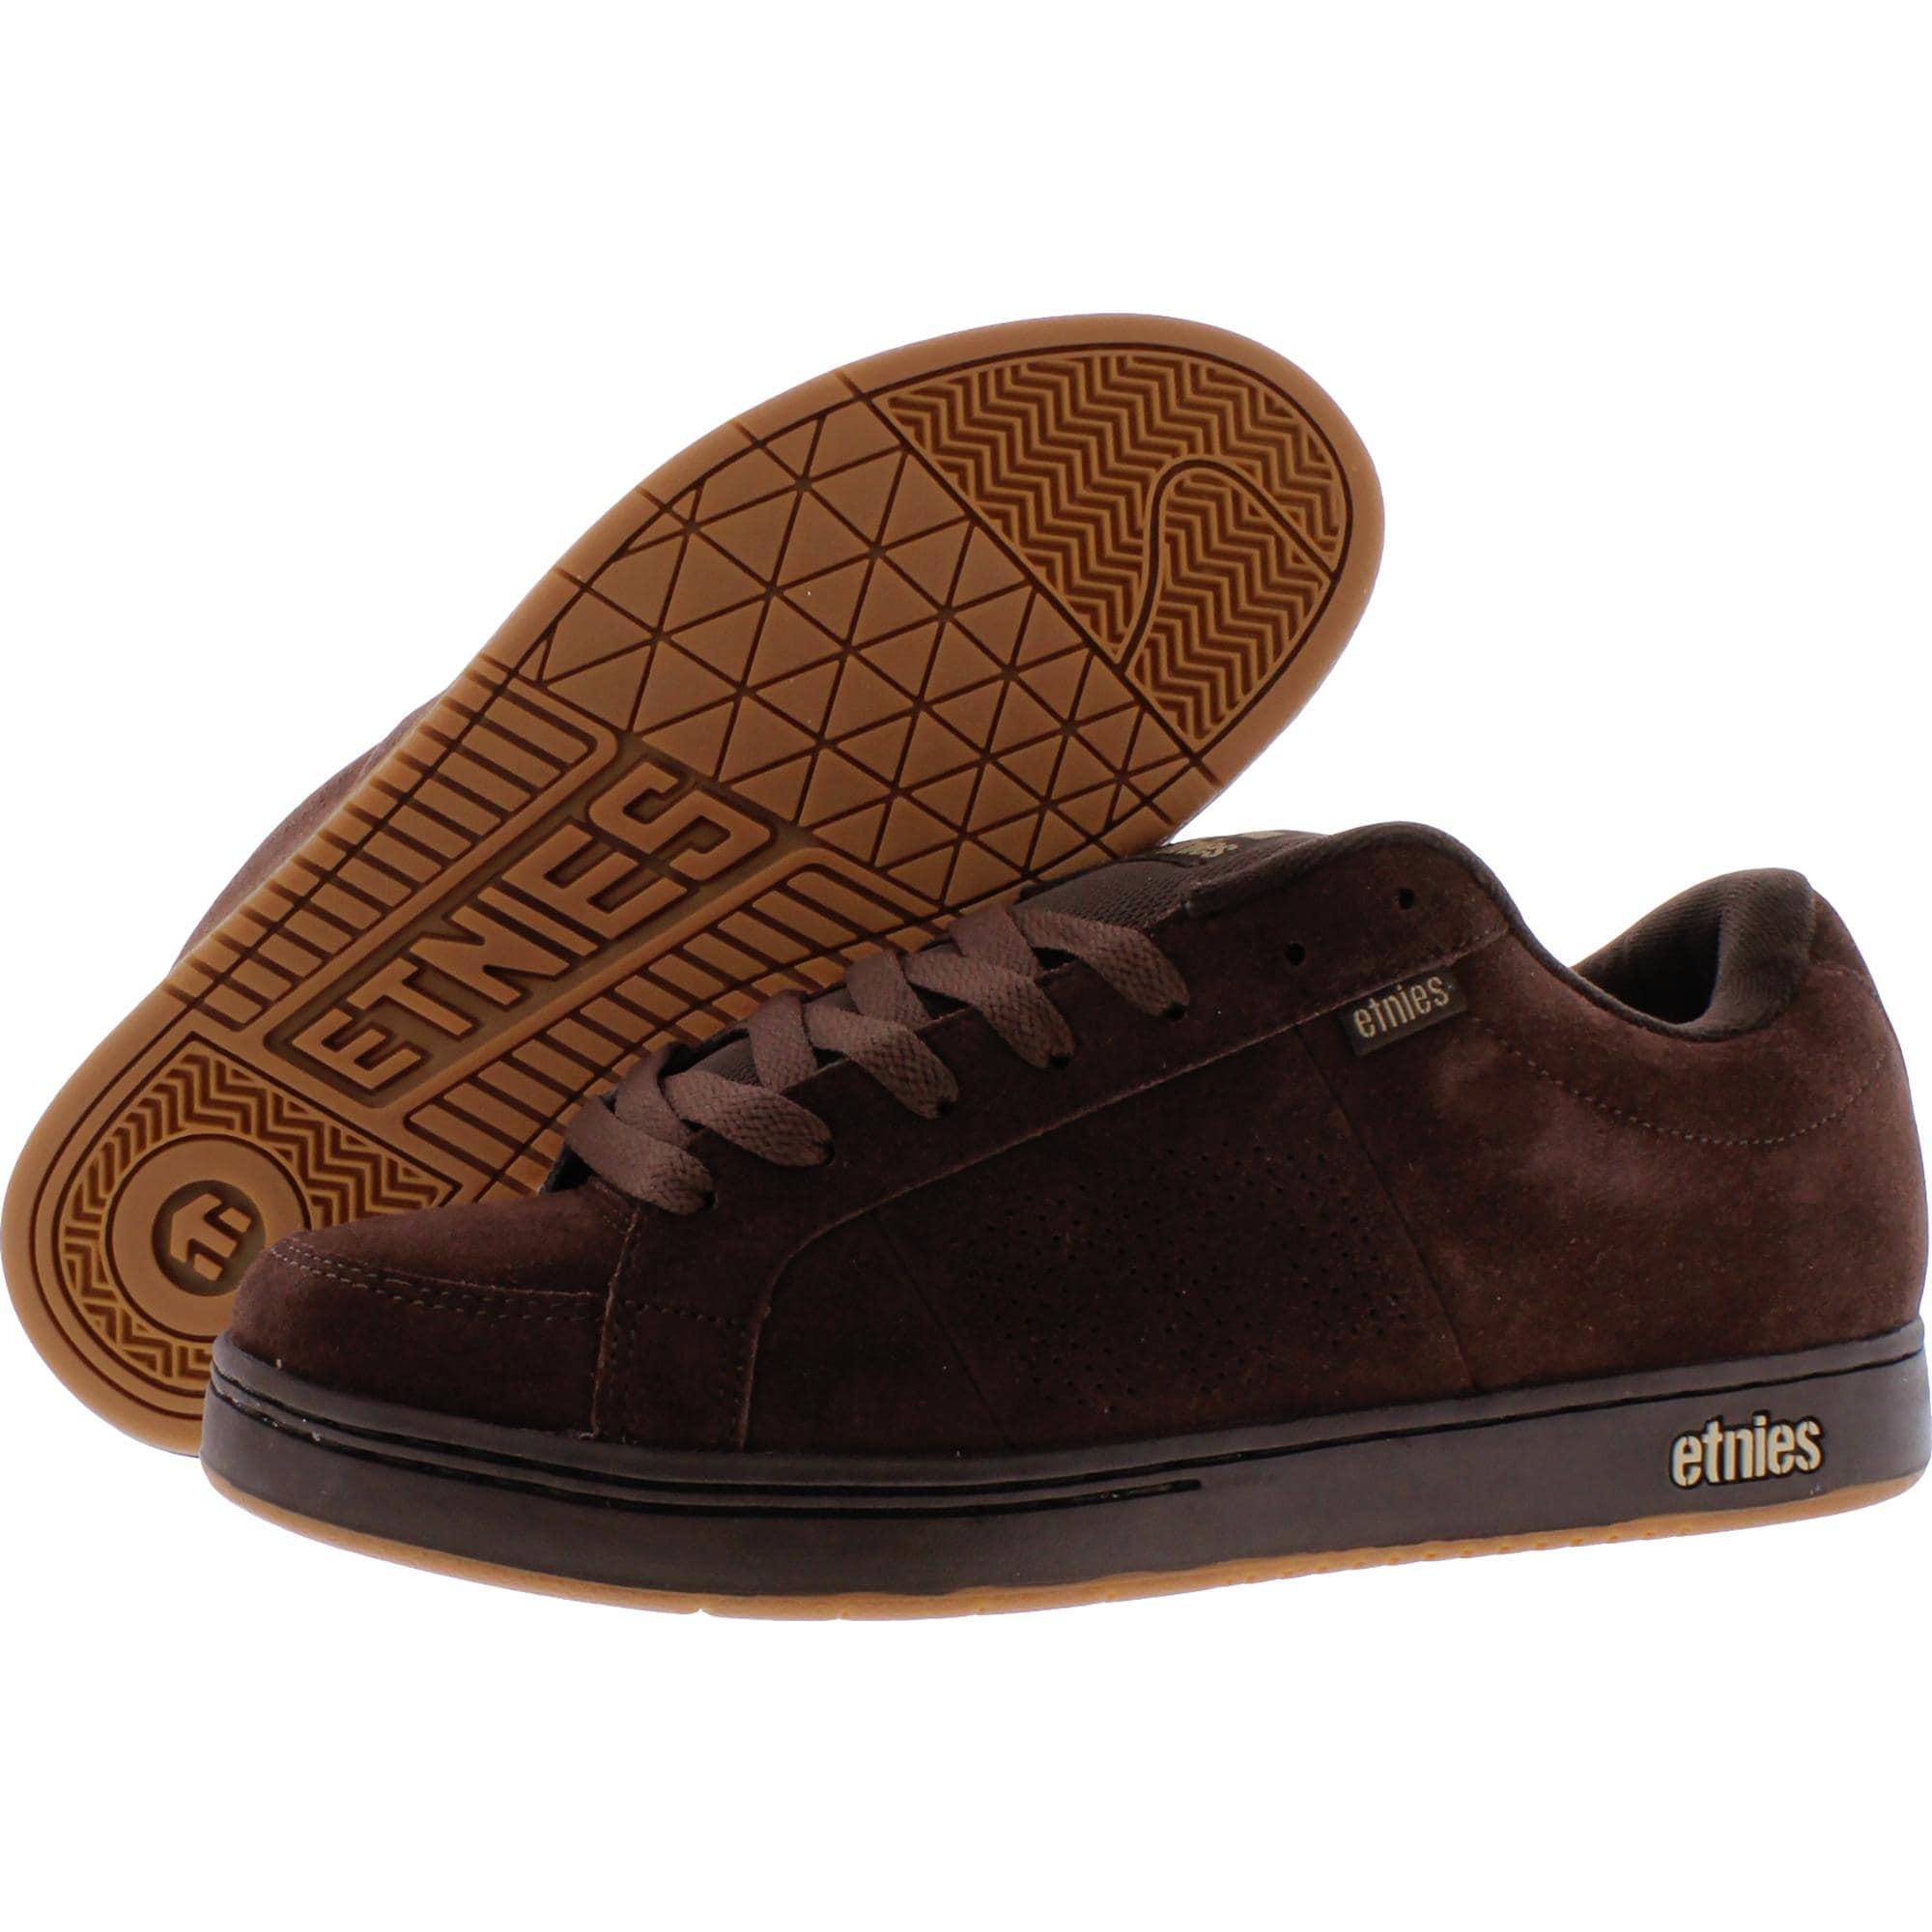 Etnies Men/'s Kingpin Suede Mid-Top Trainer Skate Shoe Sneakers